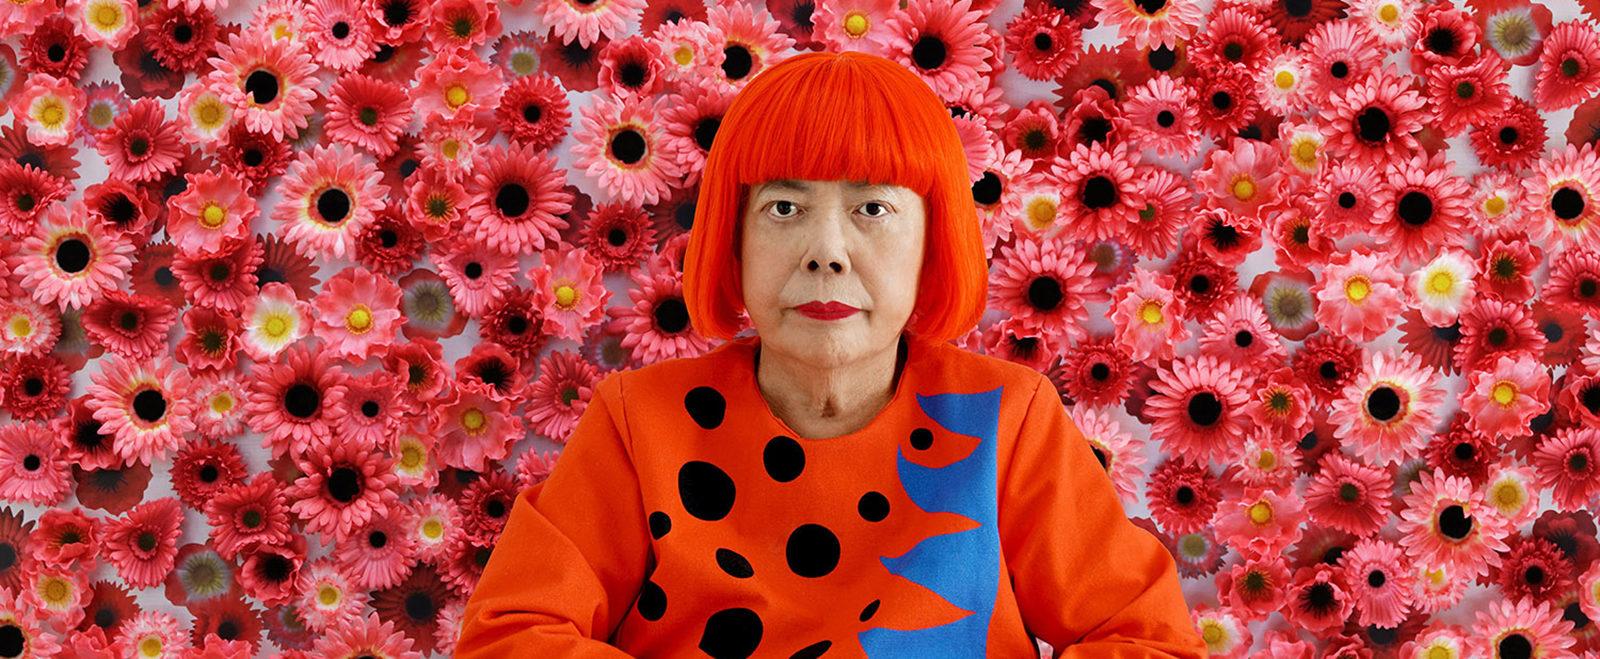 Yayoi Kusama Cosmic Nature Brooklyn Botanical Garden may New York Art Exhibition